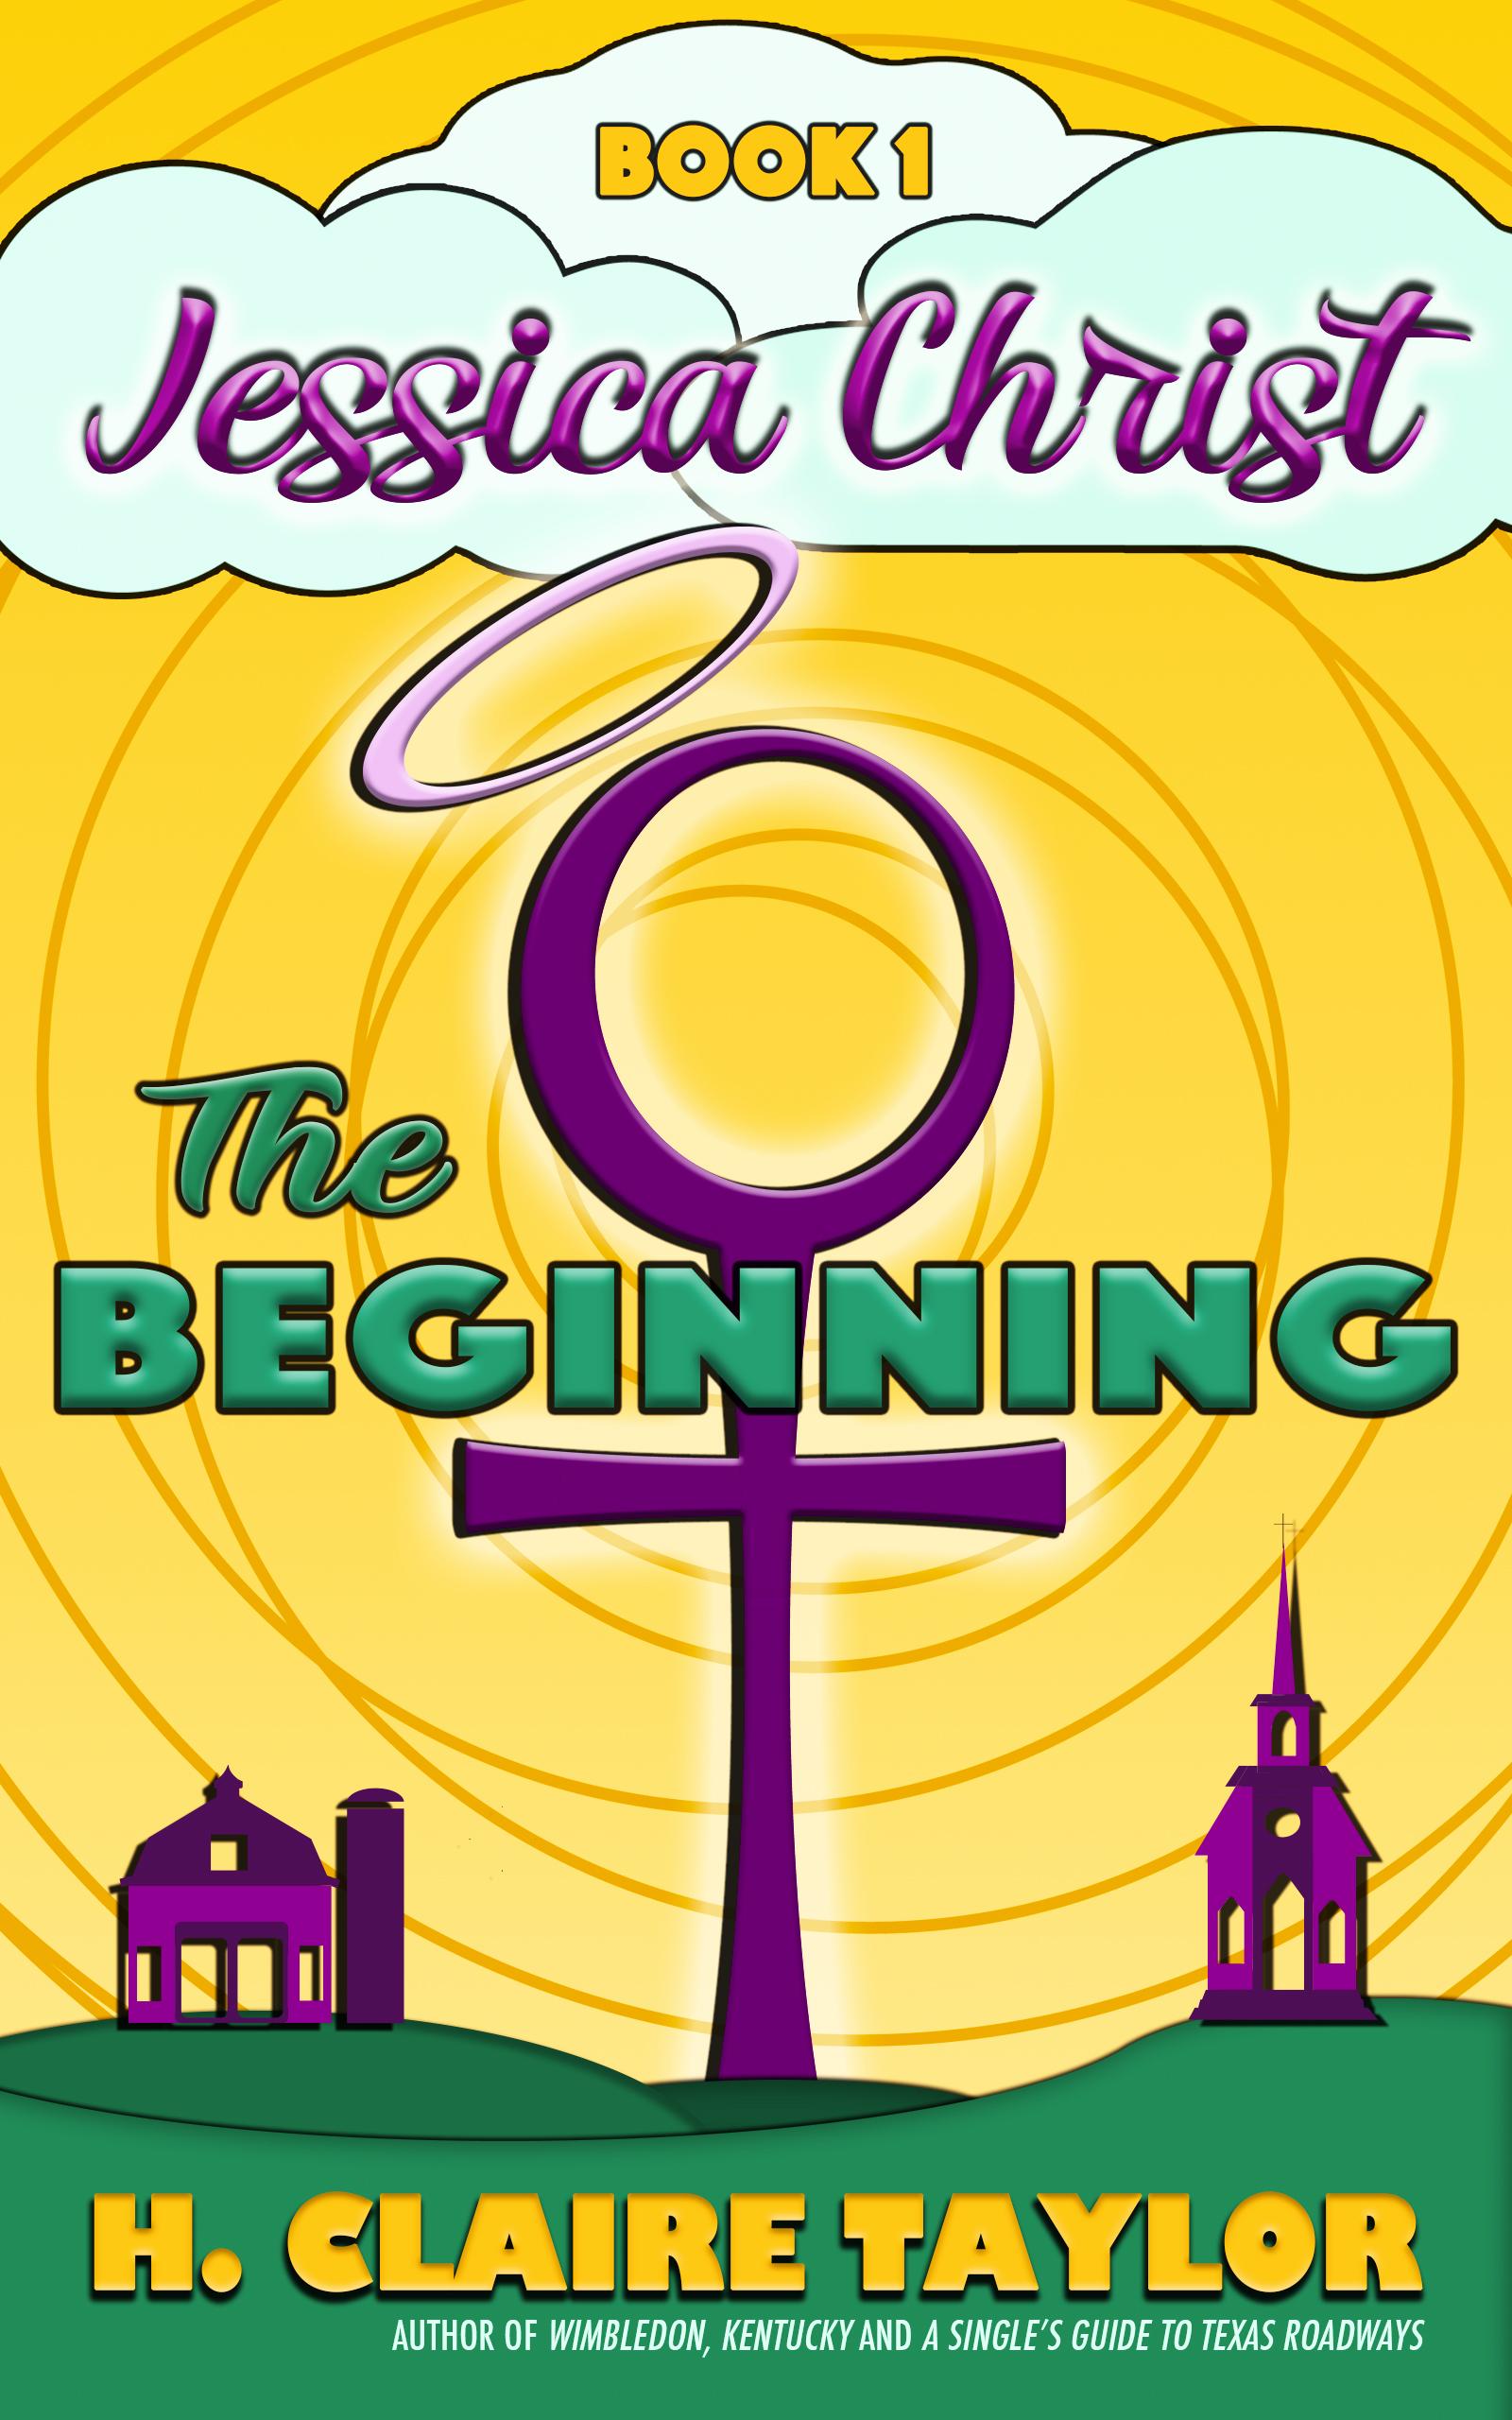 Jessica Christ Book 1 Cover 2.jpg